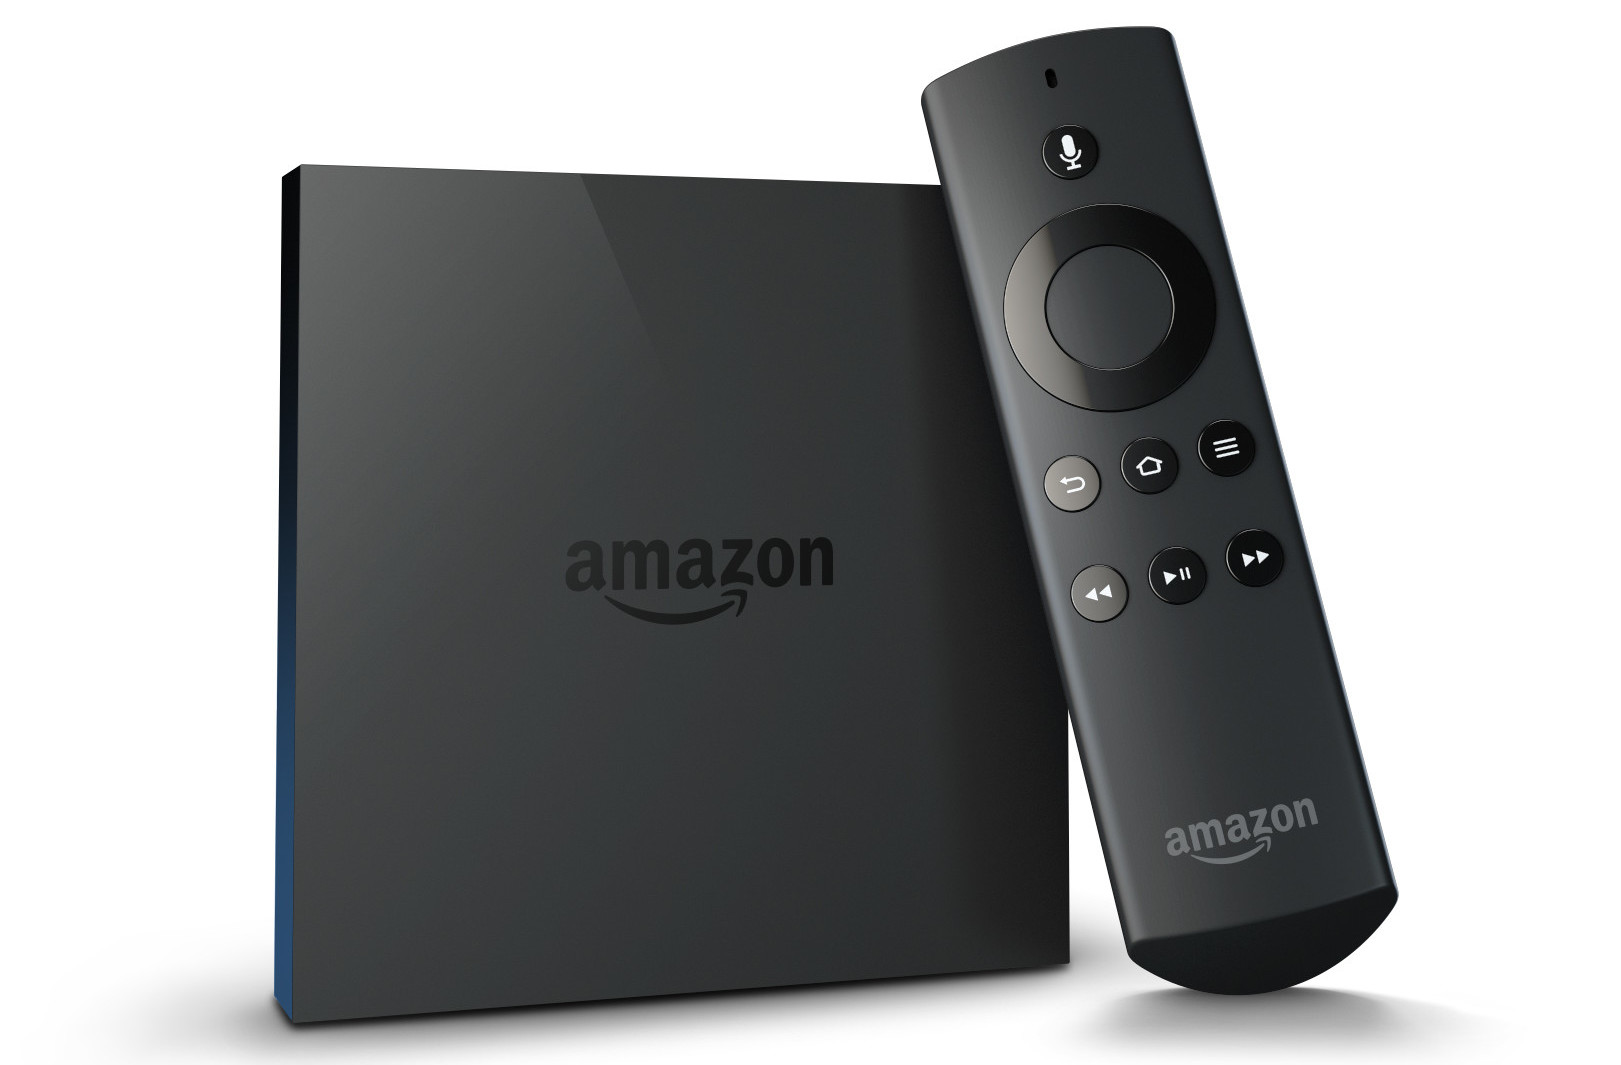 Fire TV isn't dead: Amazon touts rapid content growth, jabs at Apple